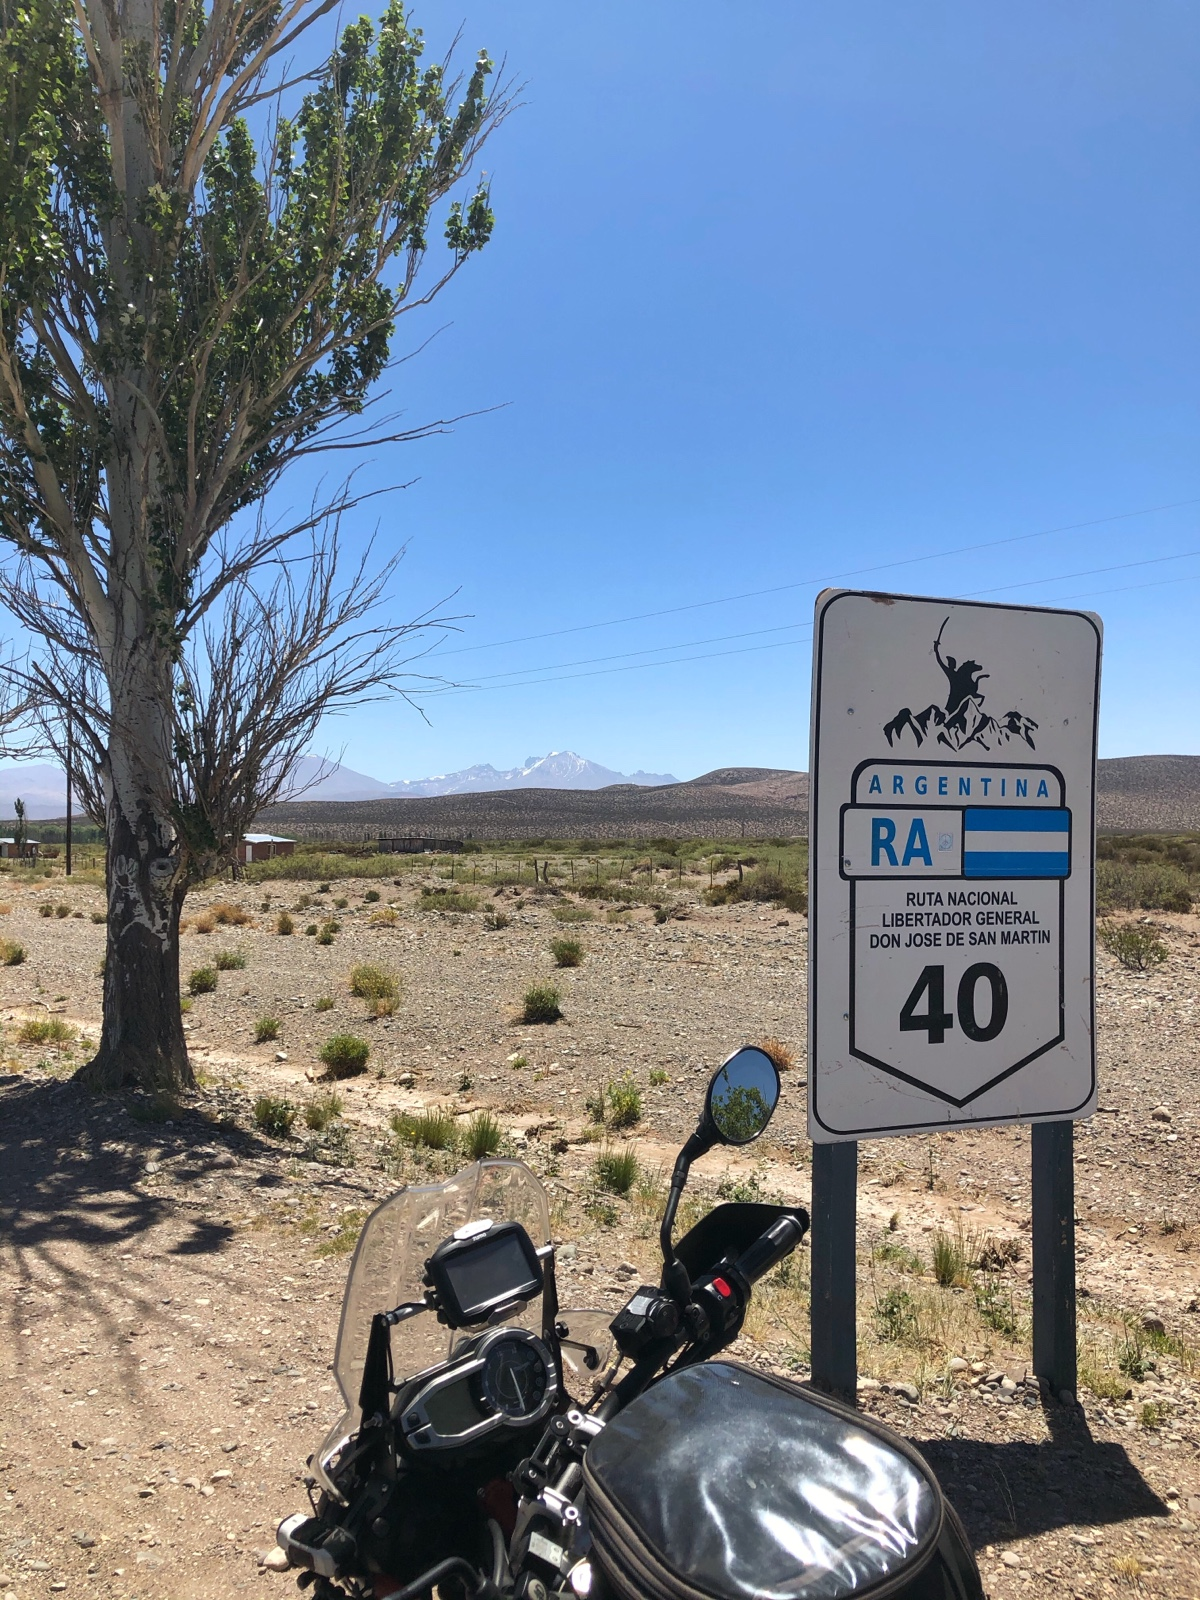 Nur noch knapp 3000 Kilometer zu fahren.